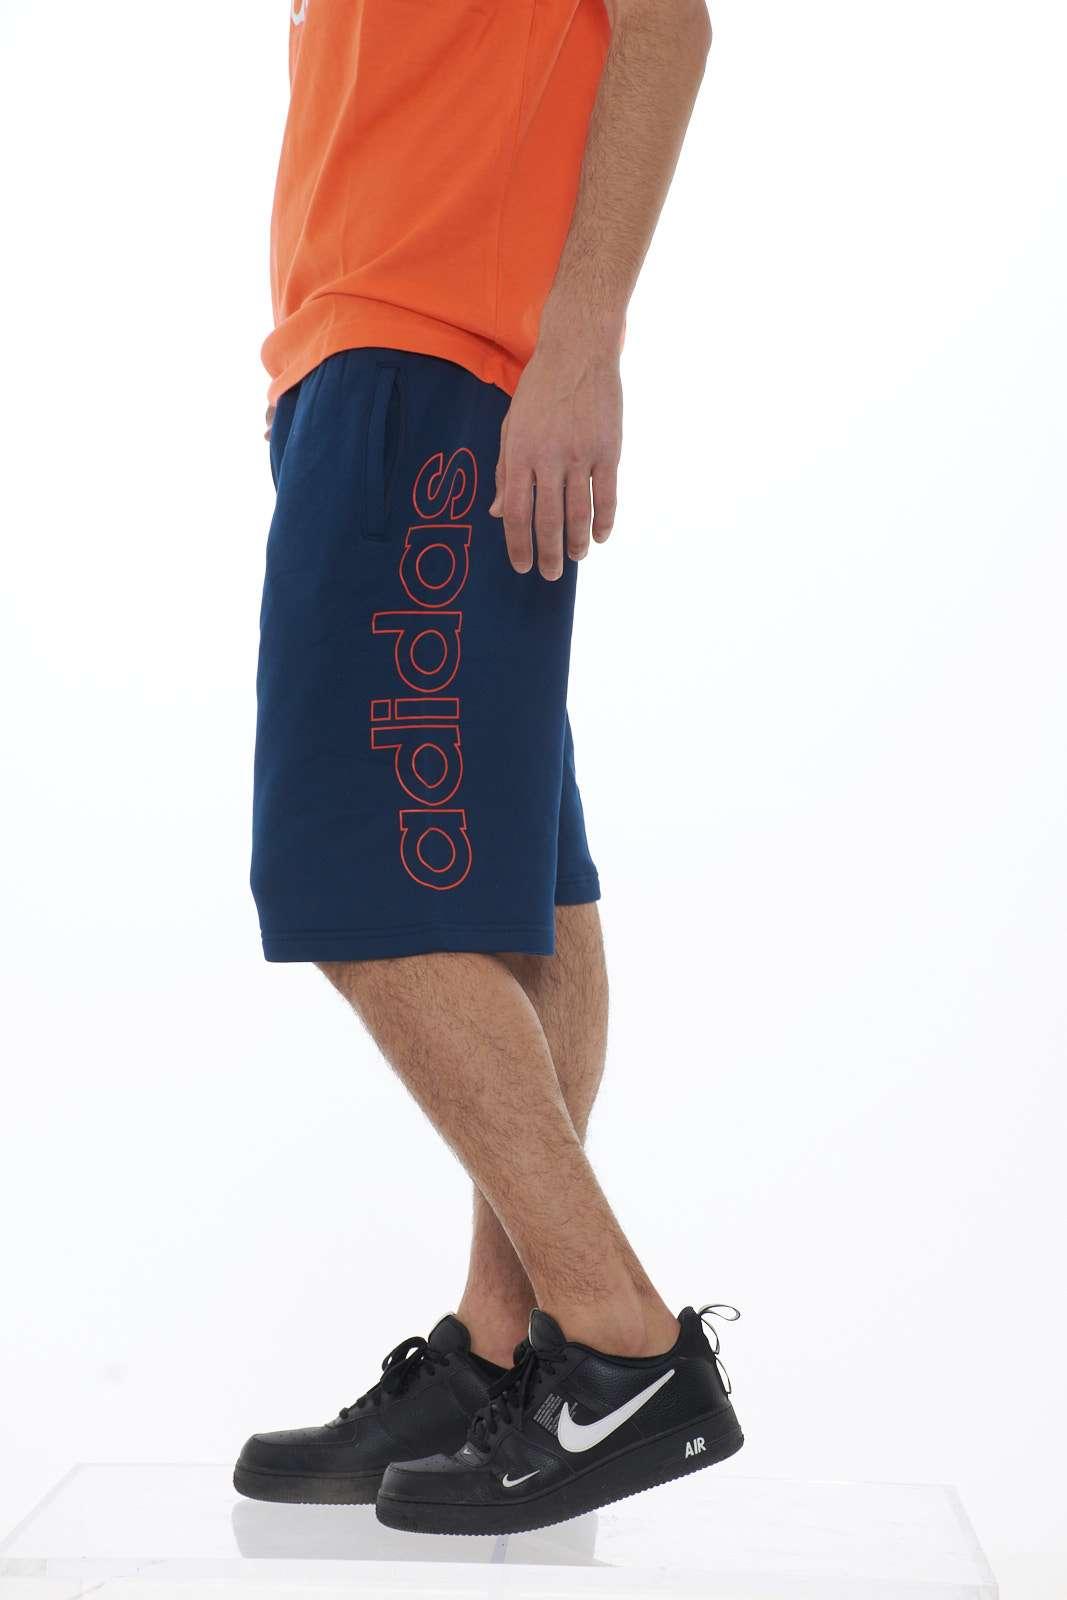 https://www.parmax.com/media/catalog/product/a/i/PE-outlet_parmax-pantaloncini-uomo-Adidas-DV3274-B.jpg